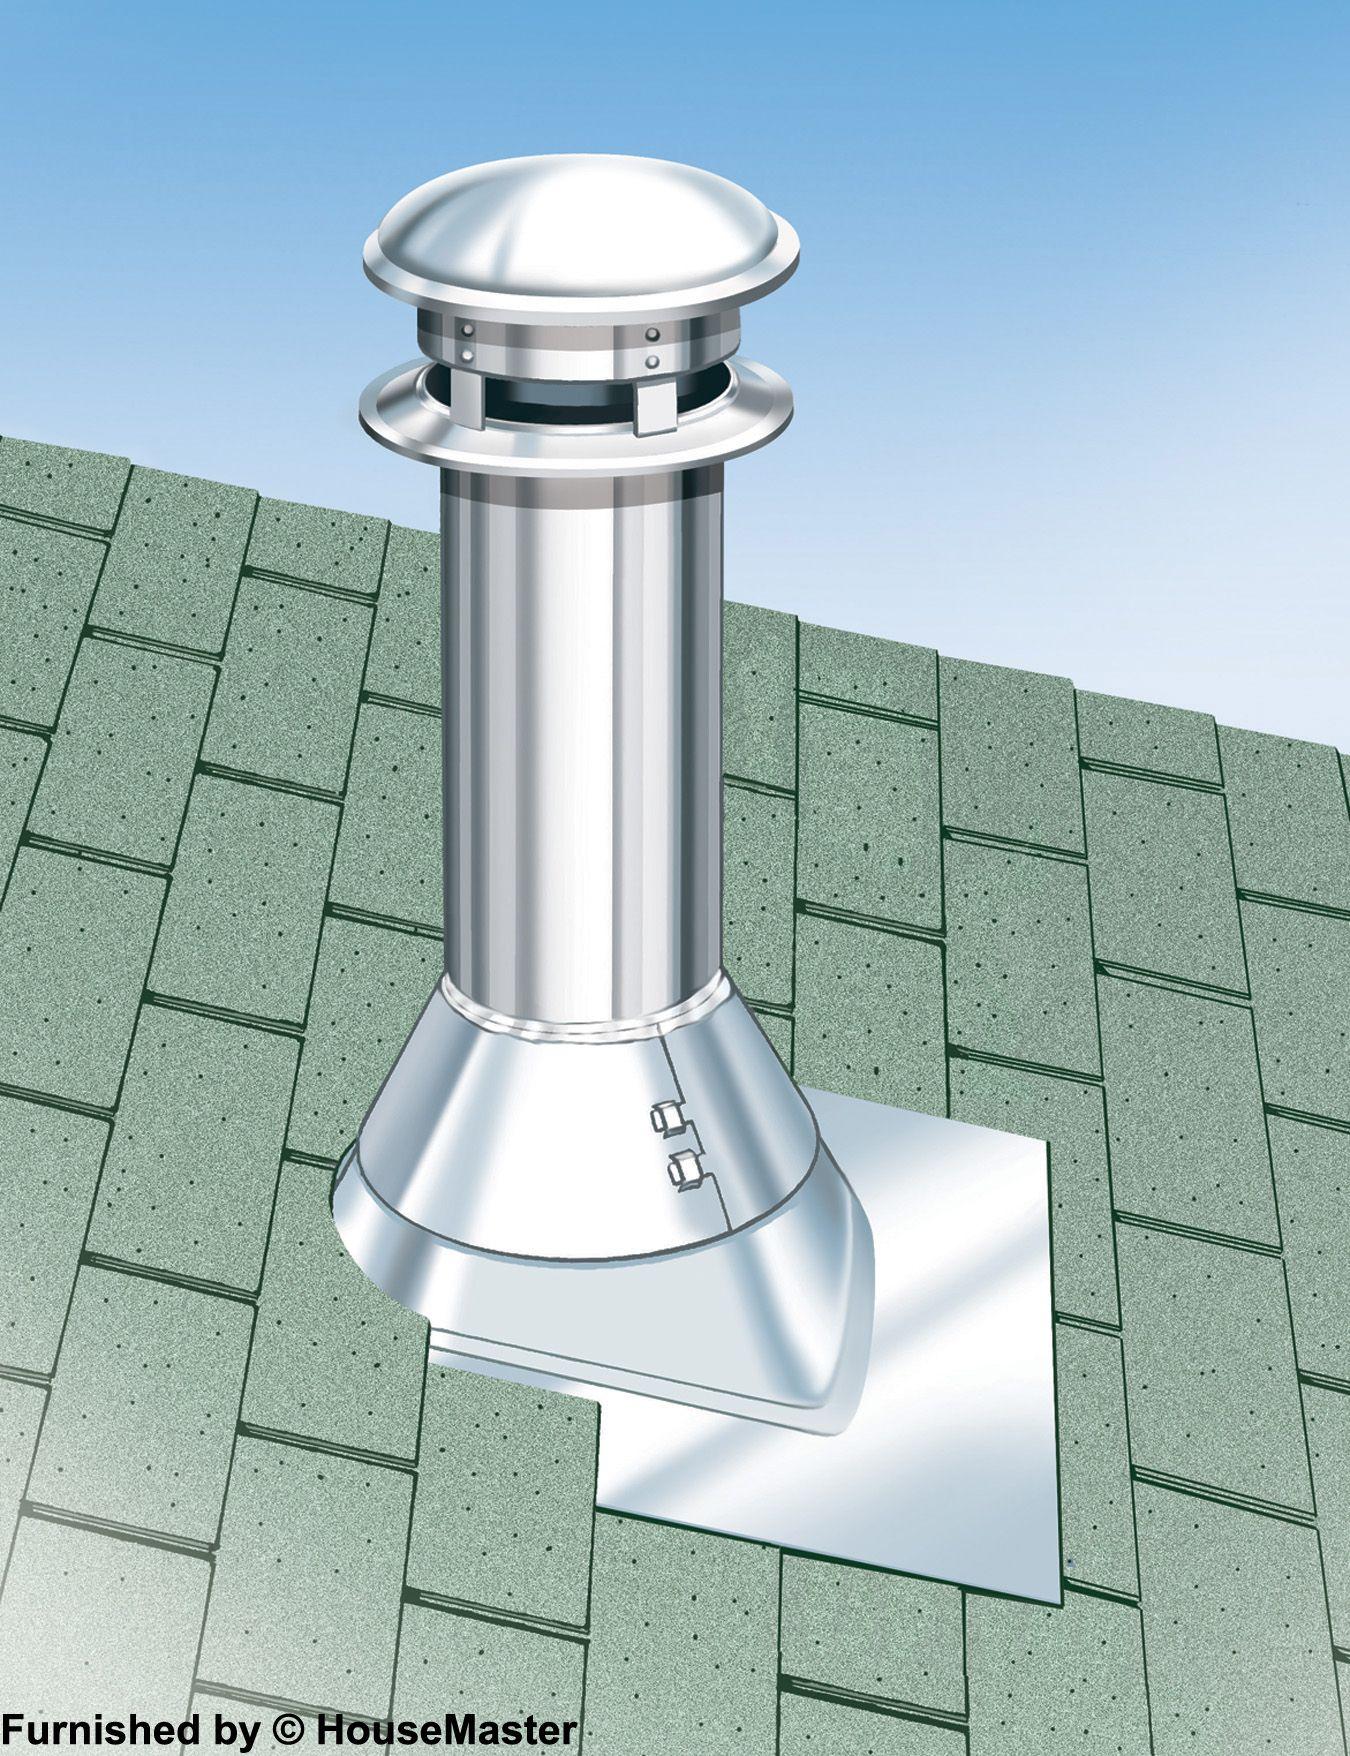 Roofing contractors and Metals